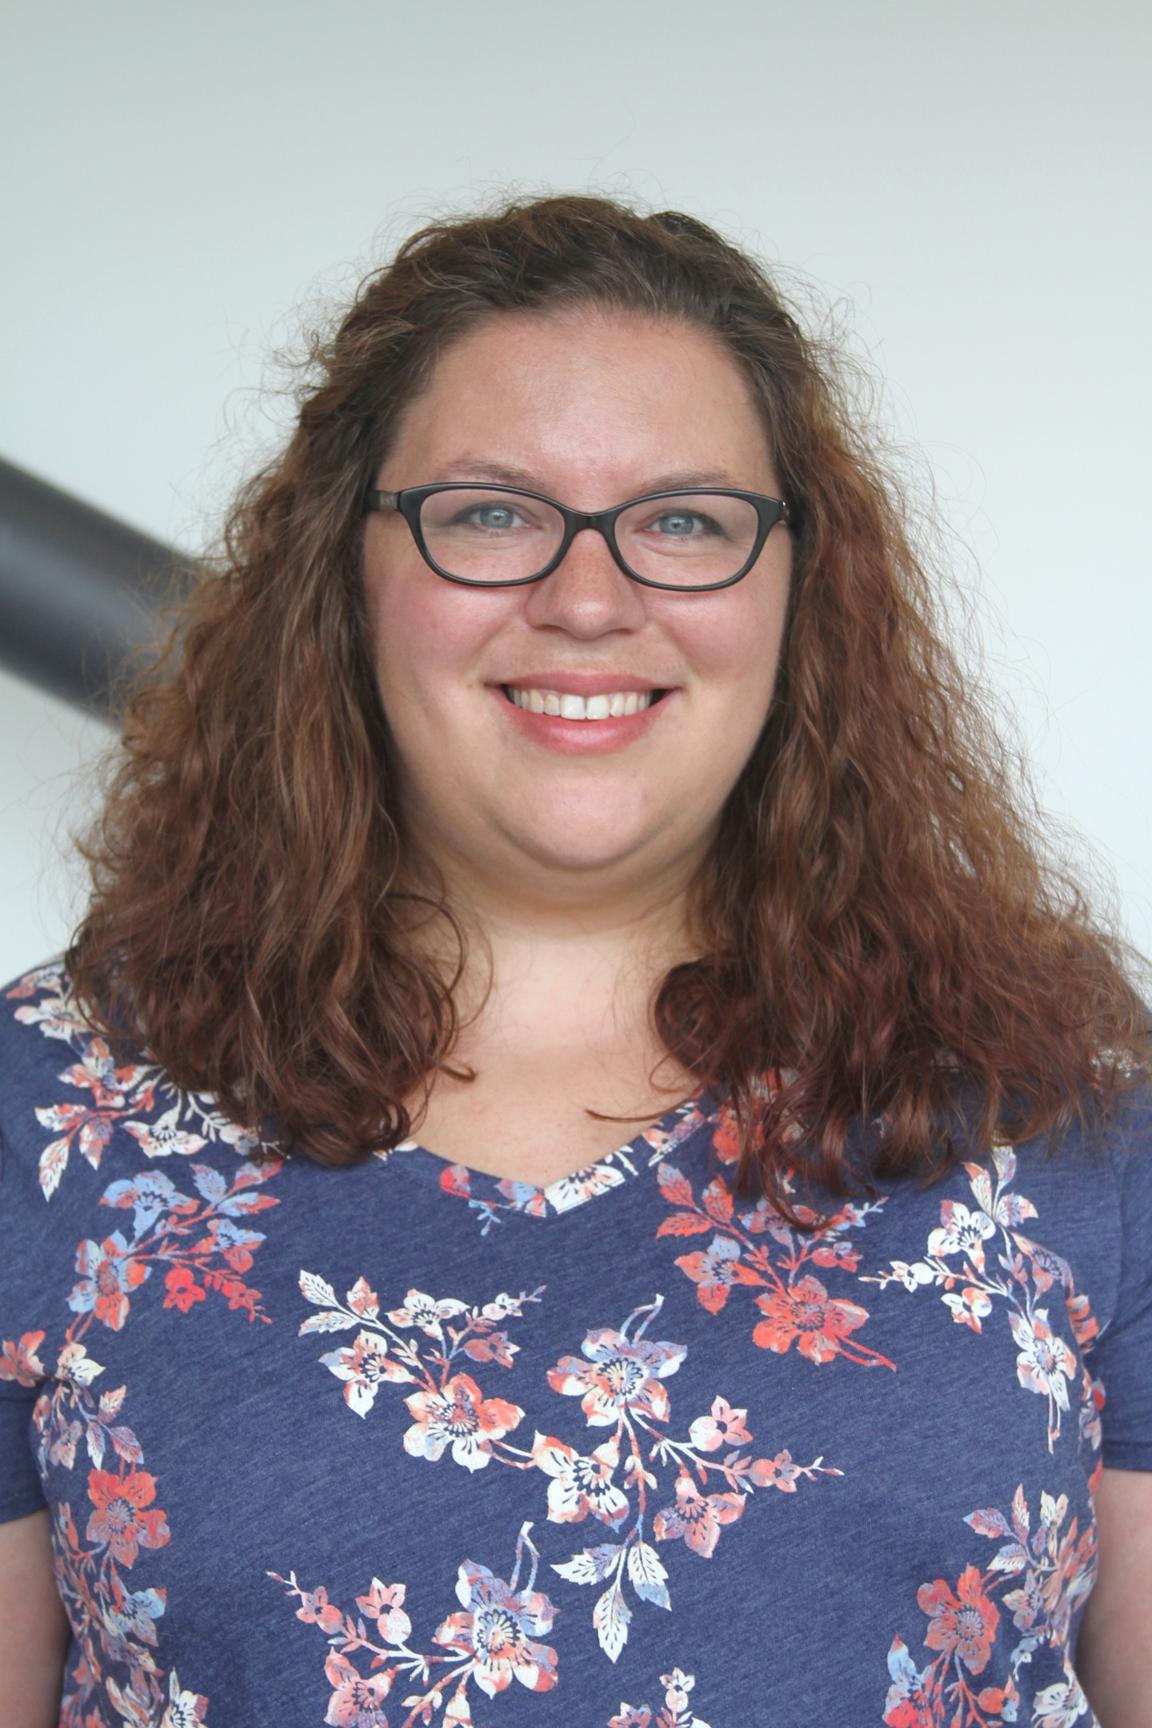 Melanie Vining Graduate Student TA